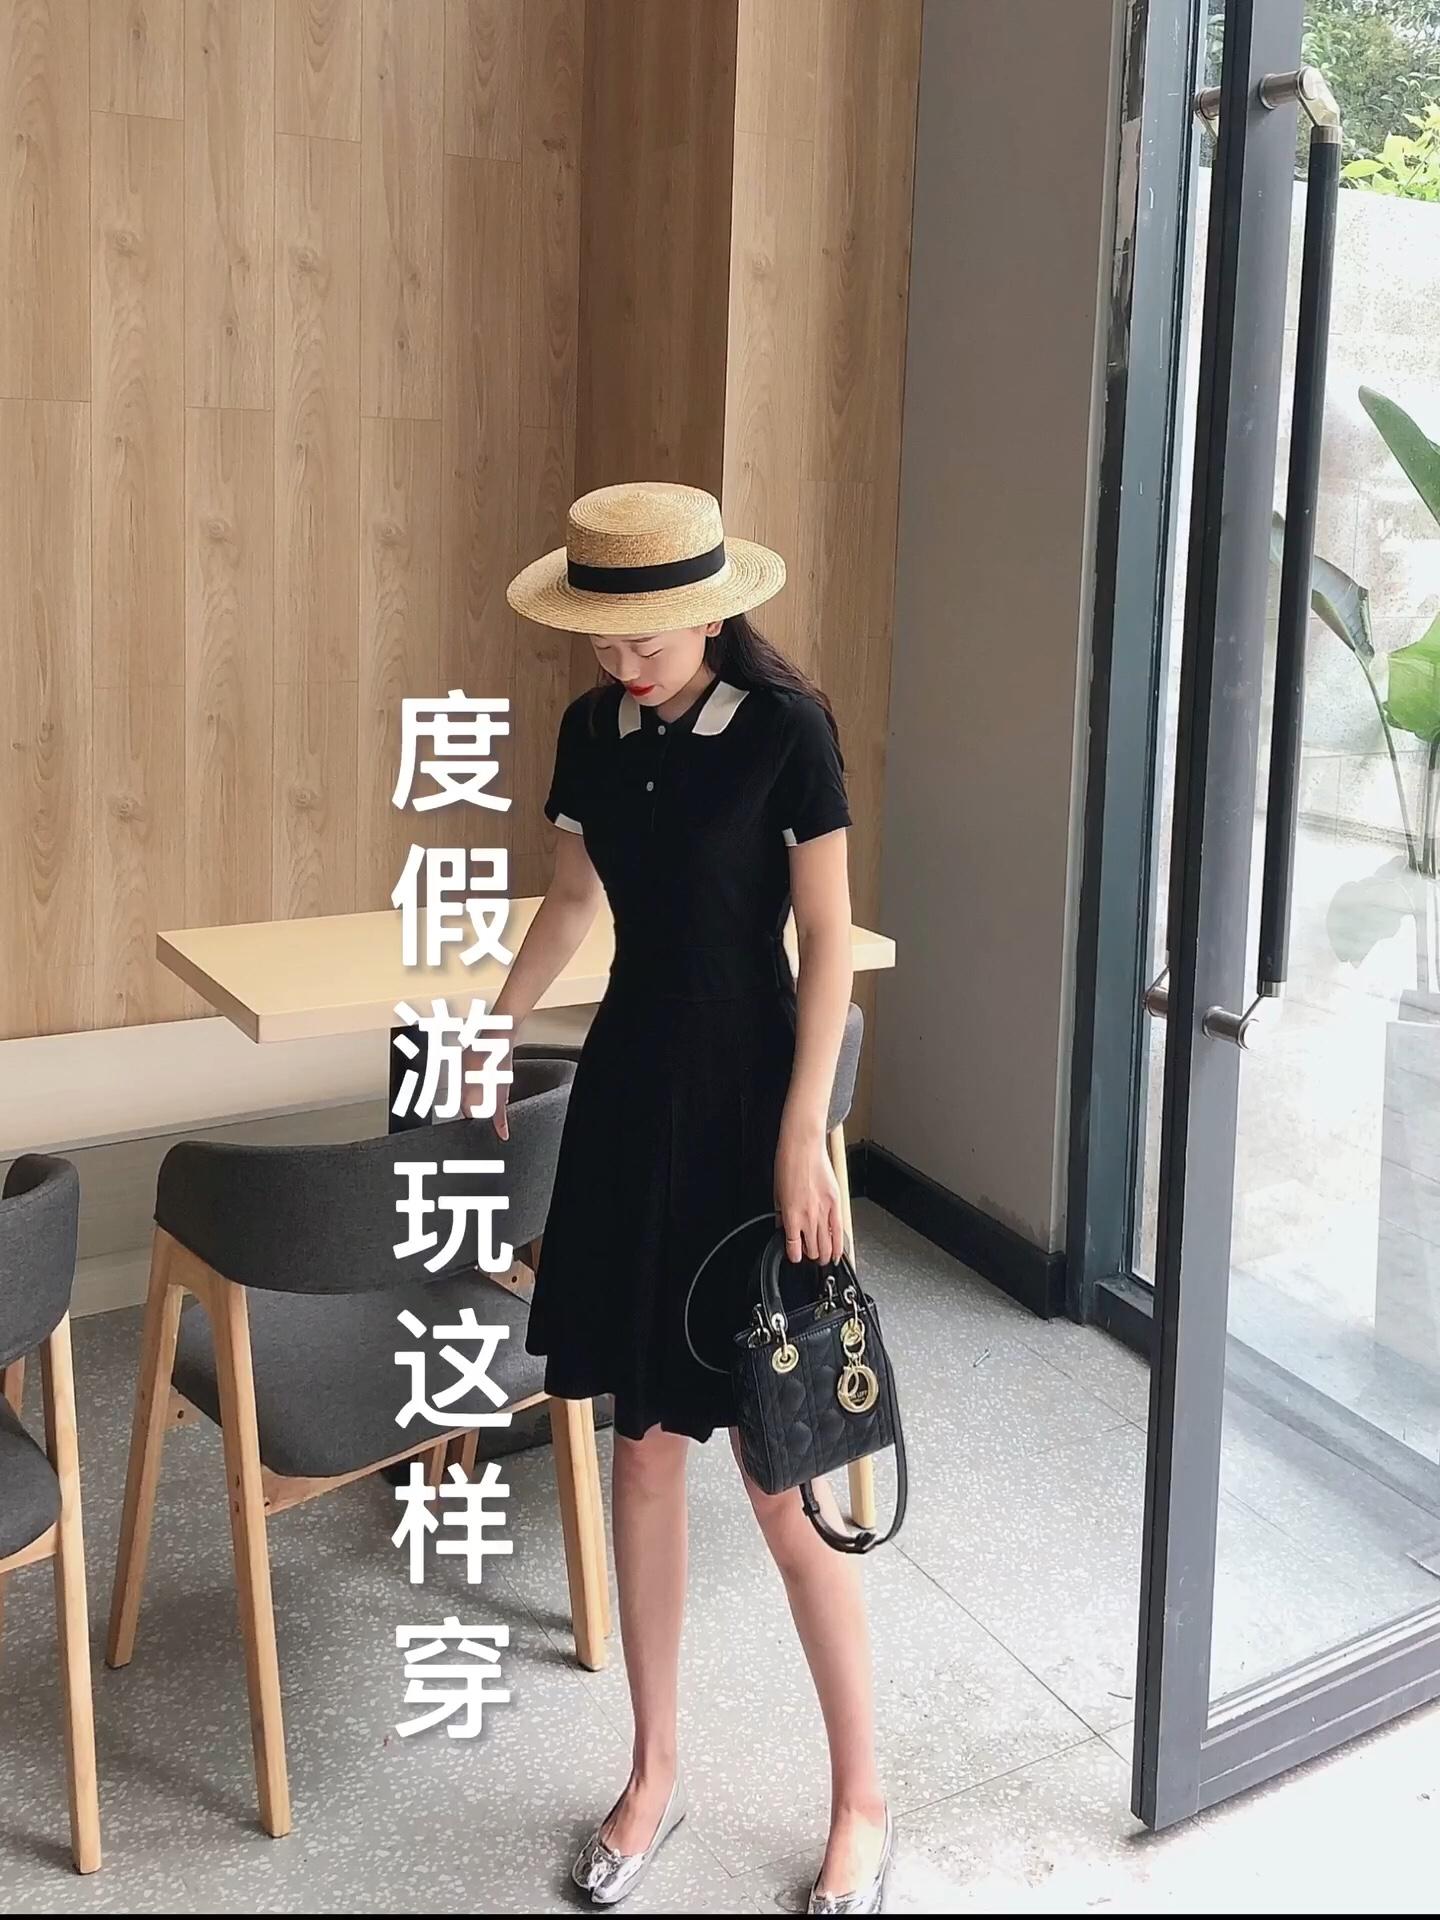 CHIOKi穿搭 ⛱️度假游玩这样穿 #150+女孩,夏日裙子酱紫穿!#  很显瘦的版型  Polo领的设计 脖子很细长哦  稀饭稀饭~ 今年最火的法式裙 漂亮美眉都入手啦 🥥🥥🥥